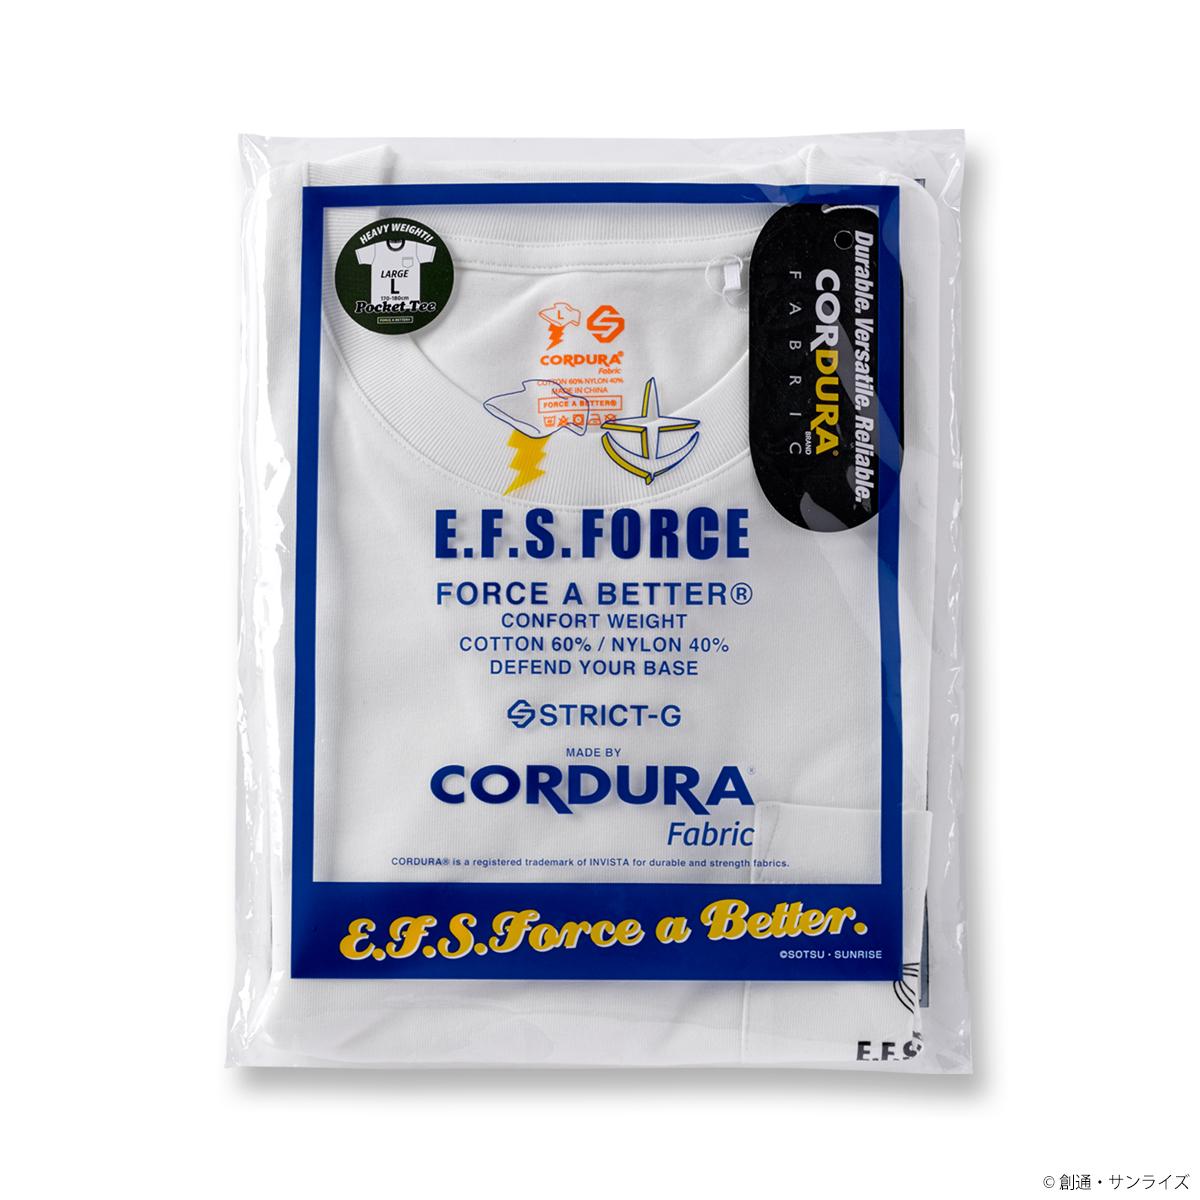 STRICT-G FAB『機動戦士ガンダム』CORDURA  ポケットTシャツ E.F.S.F.